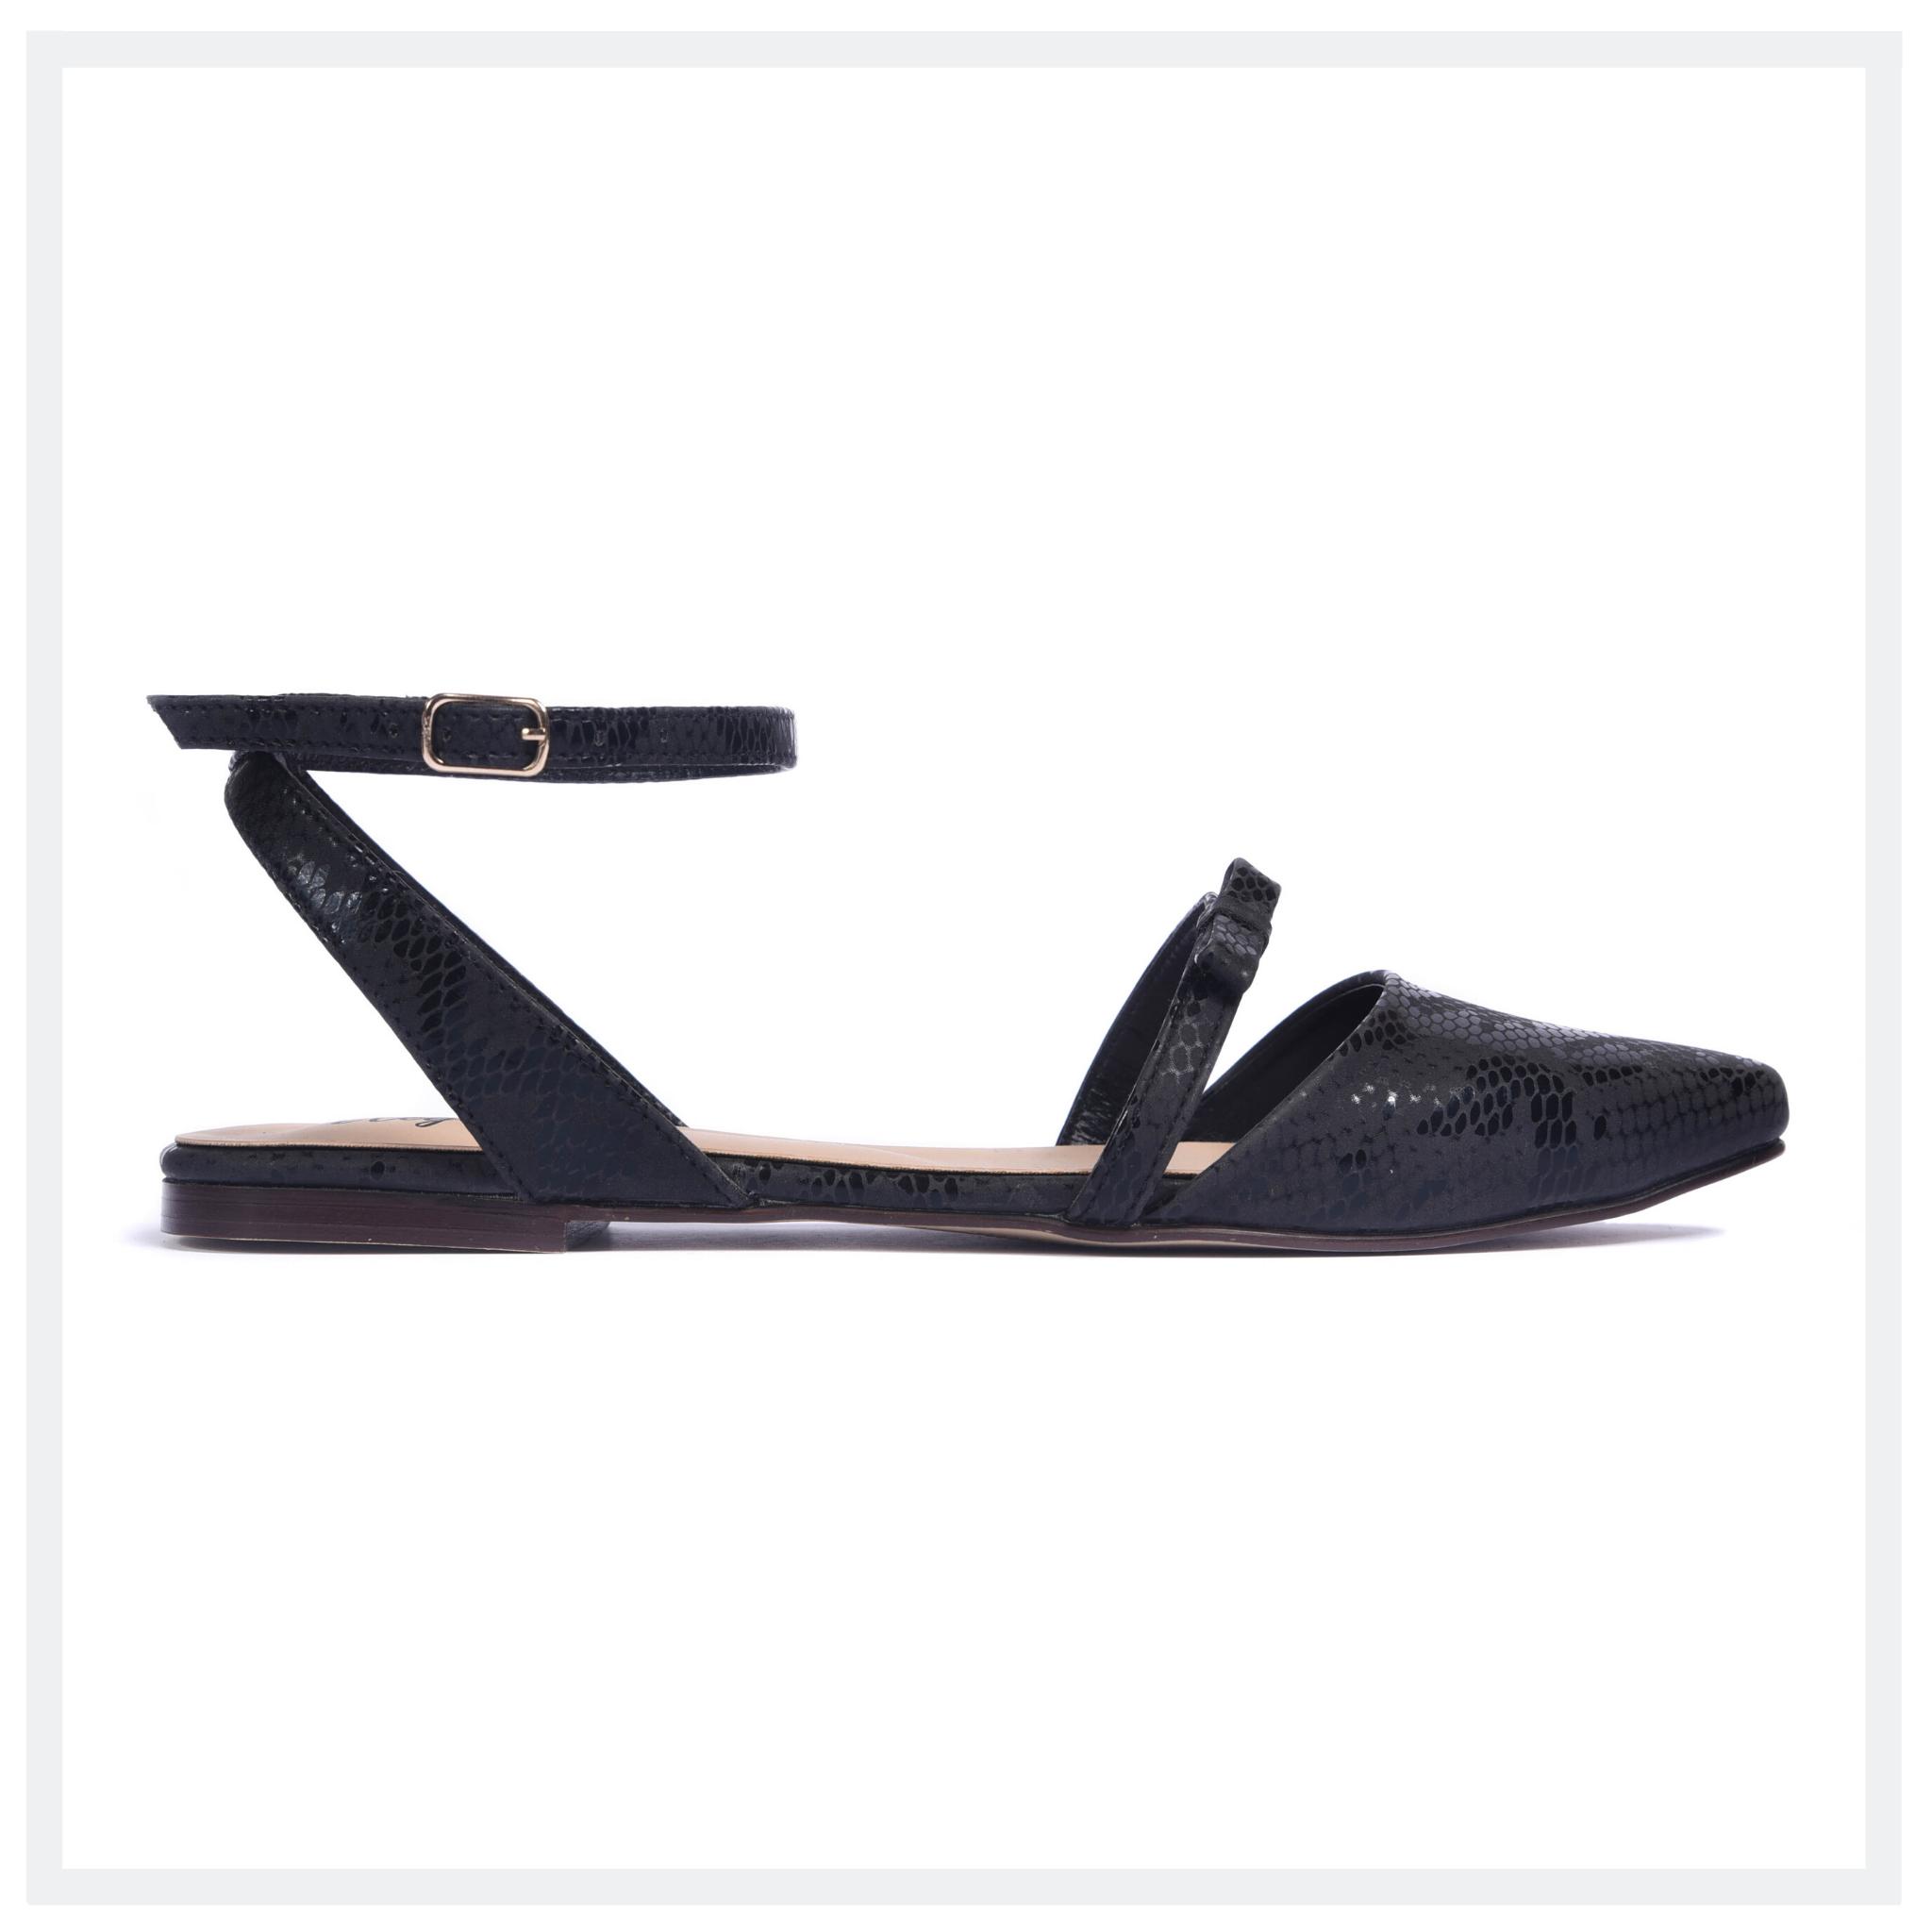 NICHOLES  Women's Flat Bow Pumps  Black  Elegancia